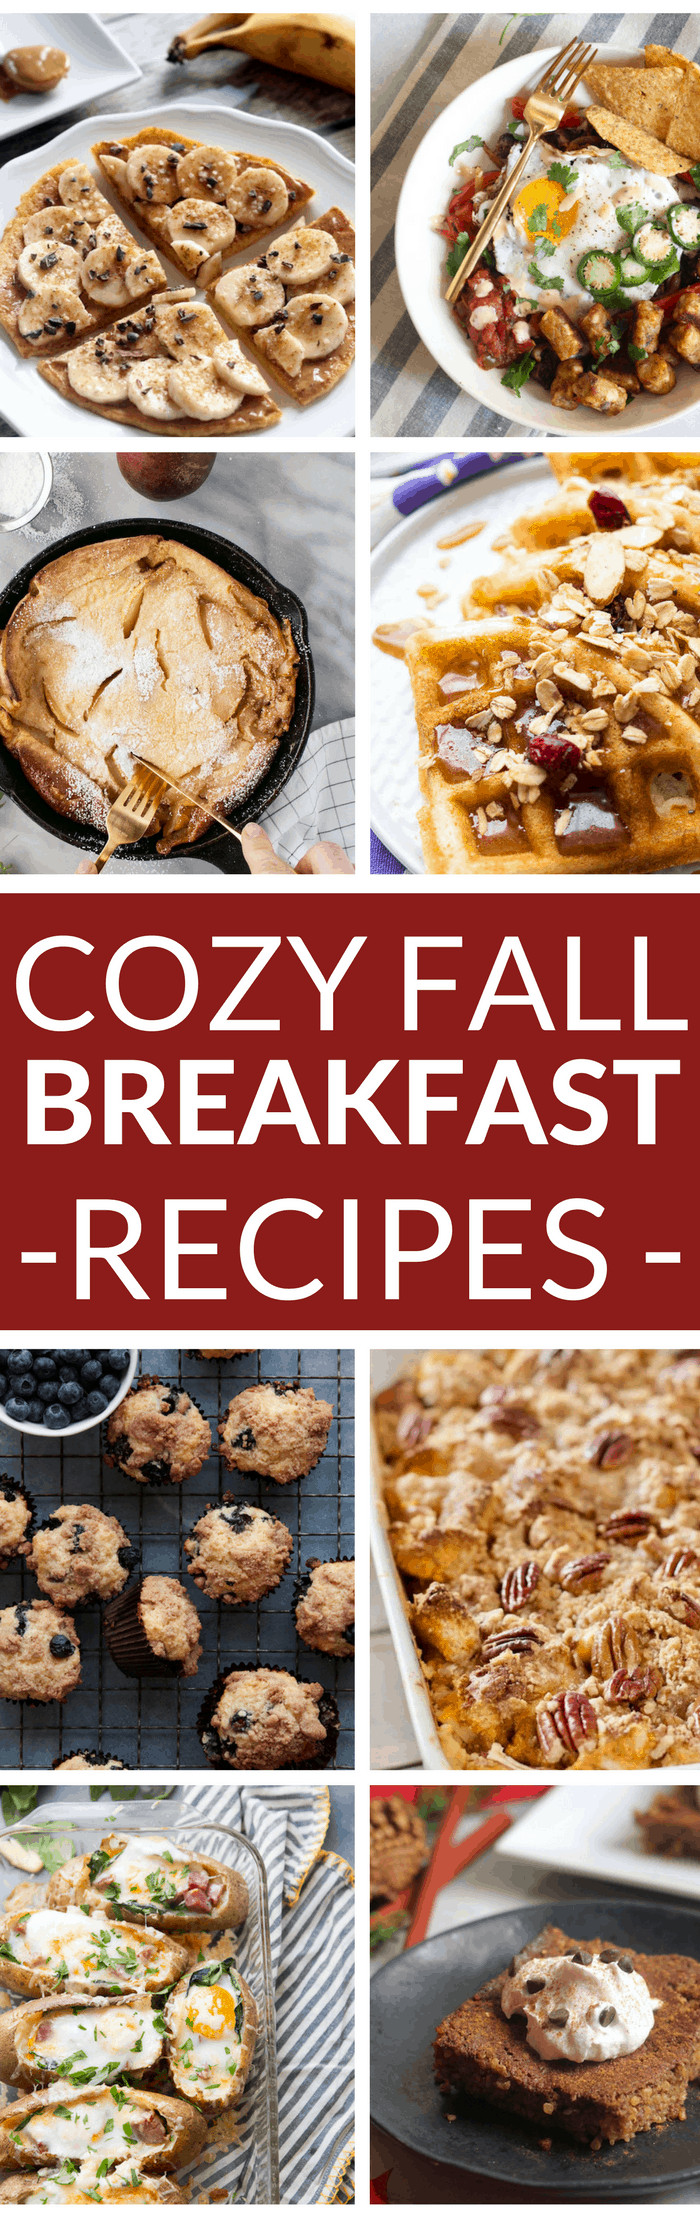 Fall Breakfast Recipe  25 Cozy Fall Breakfast Recipes Hummusapien